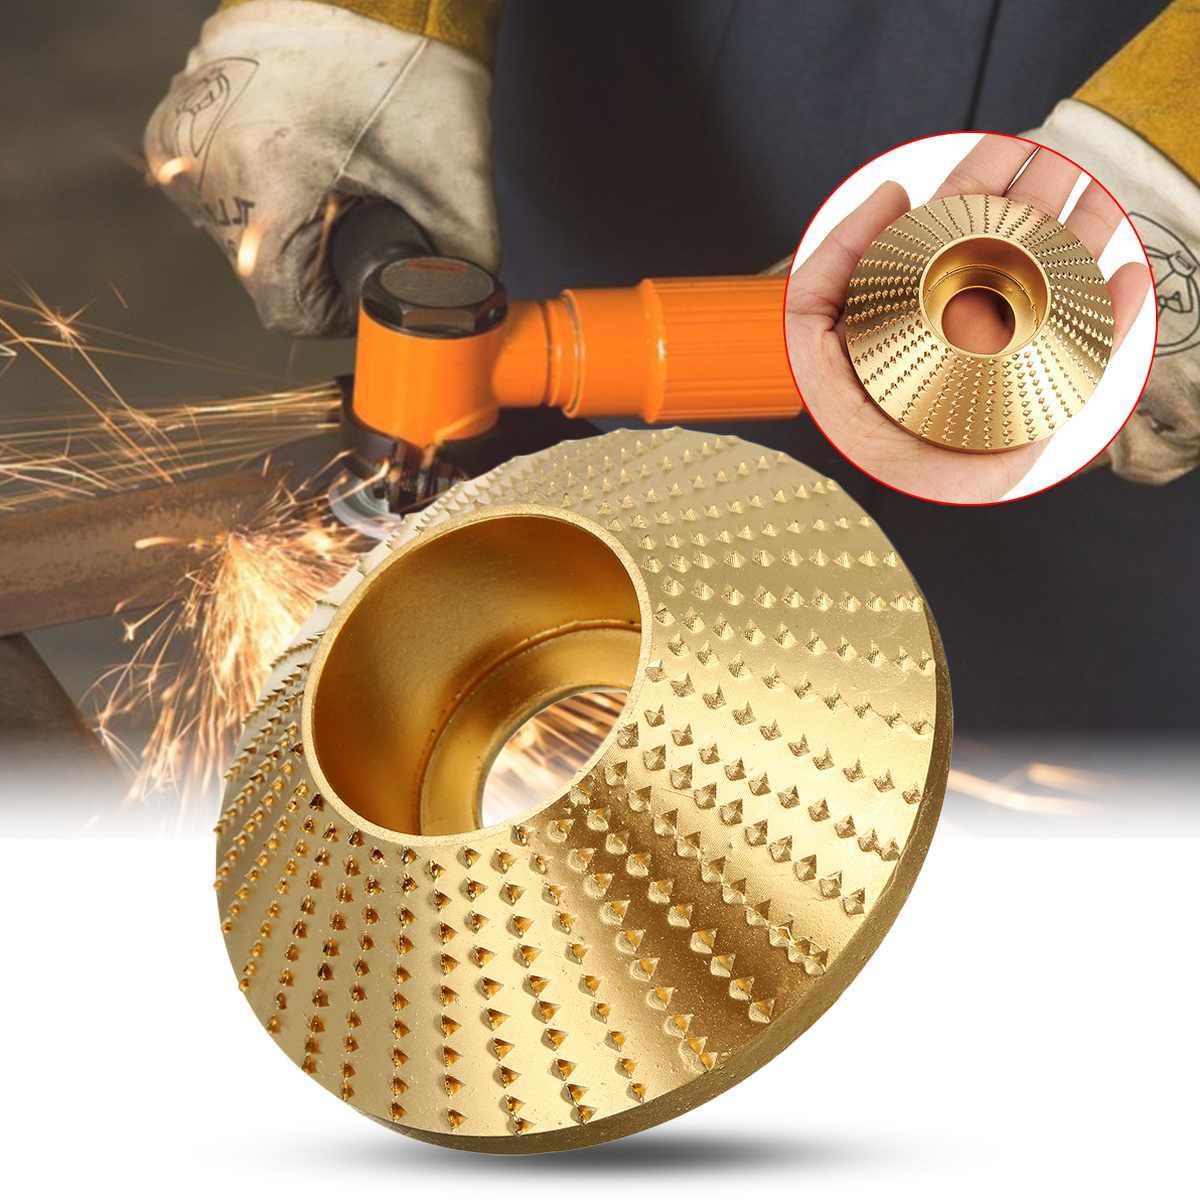 Wood Grinding Wheel Angle Grinder Disc Wood Carving Disc Sanding Abrasive Tool 75/85/100mm Silver/gold